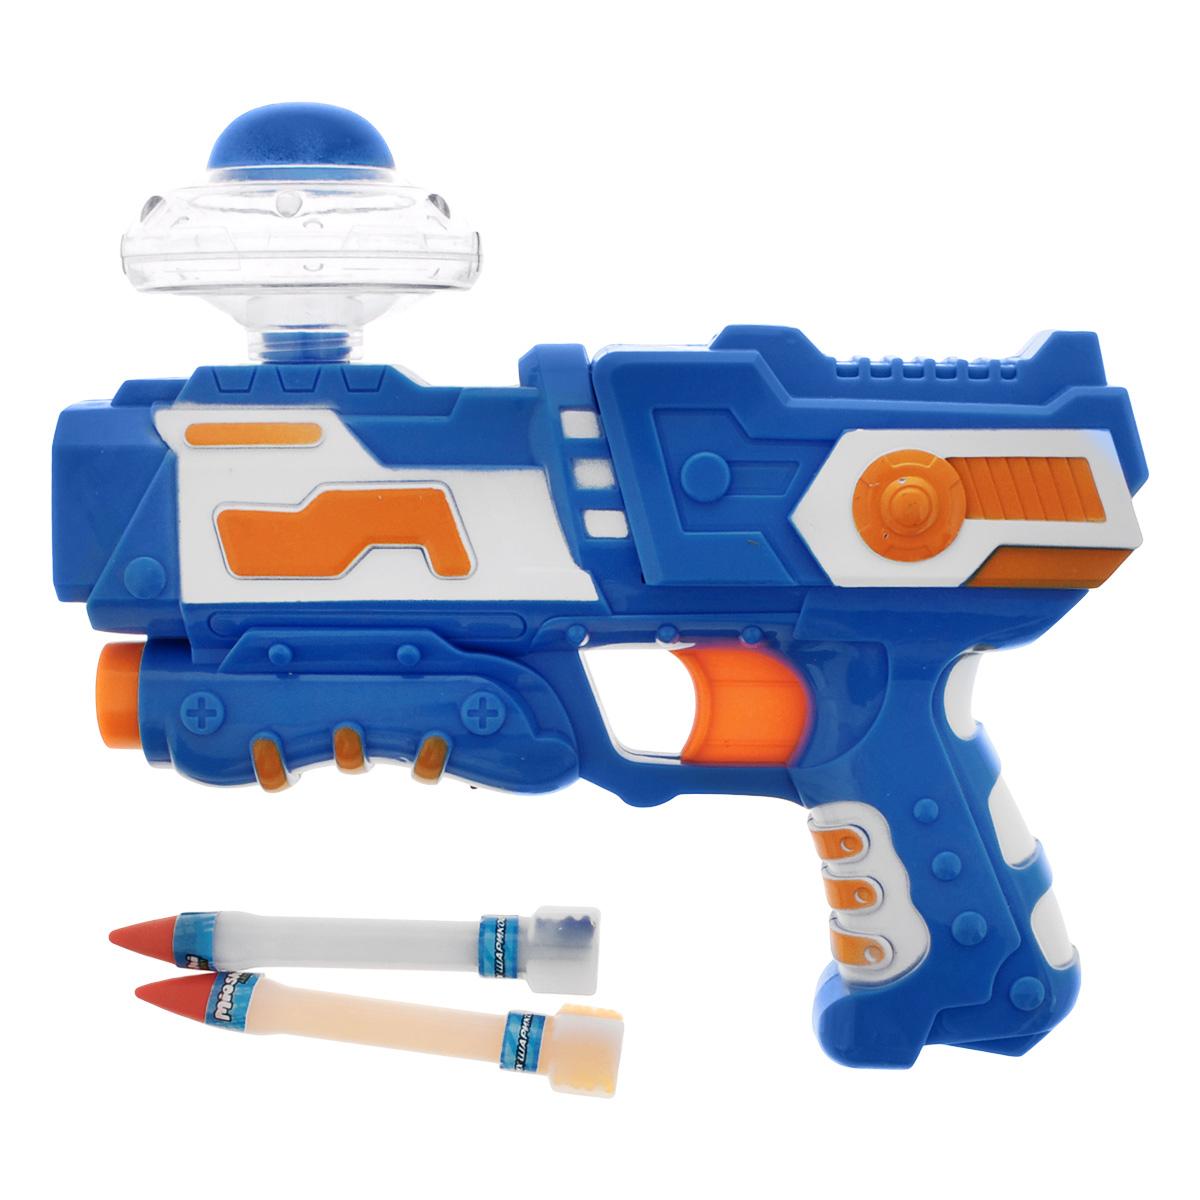 "Бластер Mioshi Army ""Меткий стрелок"", цвет: голубой MAR1106-005"